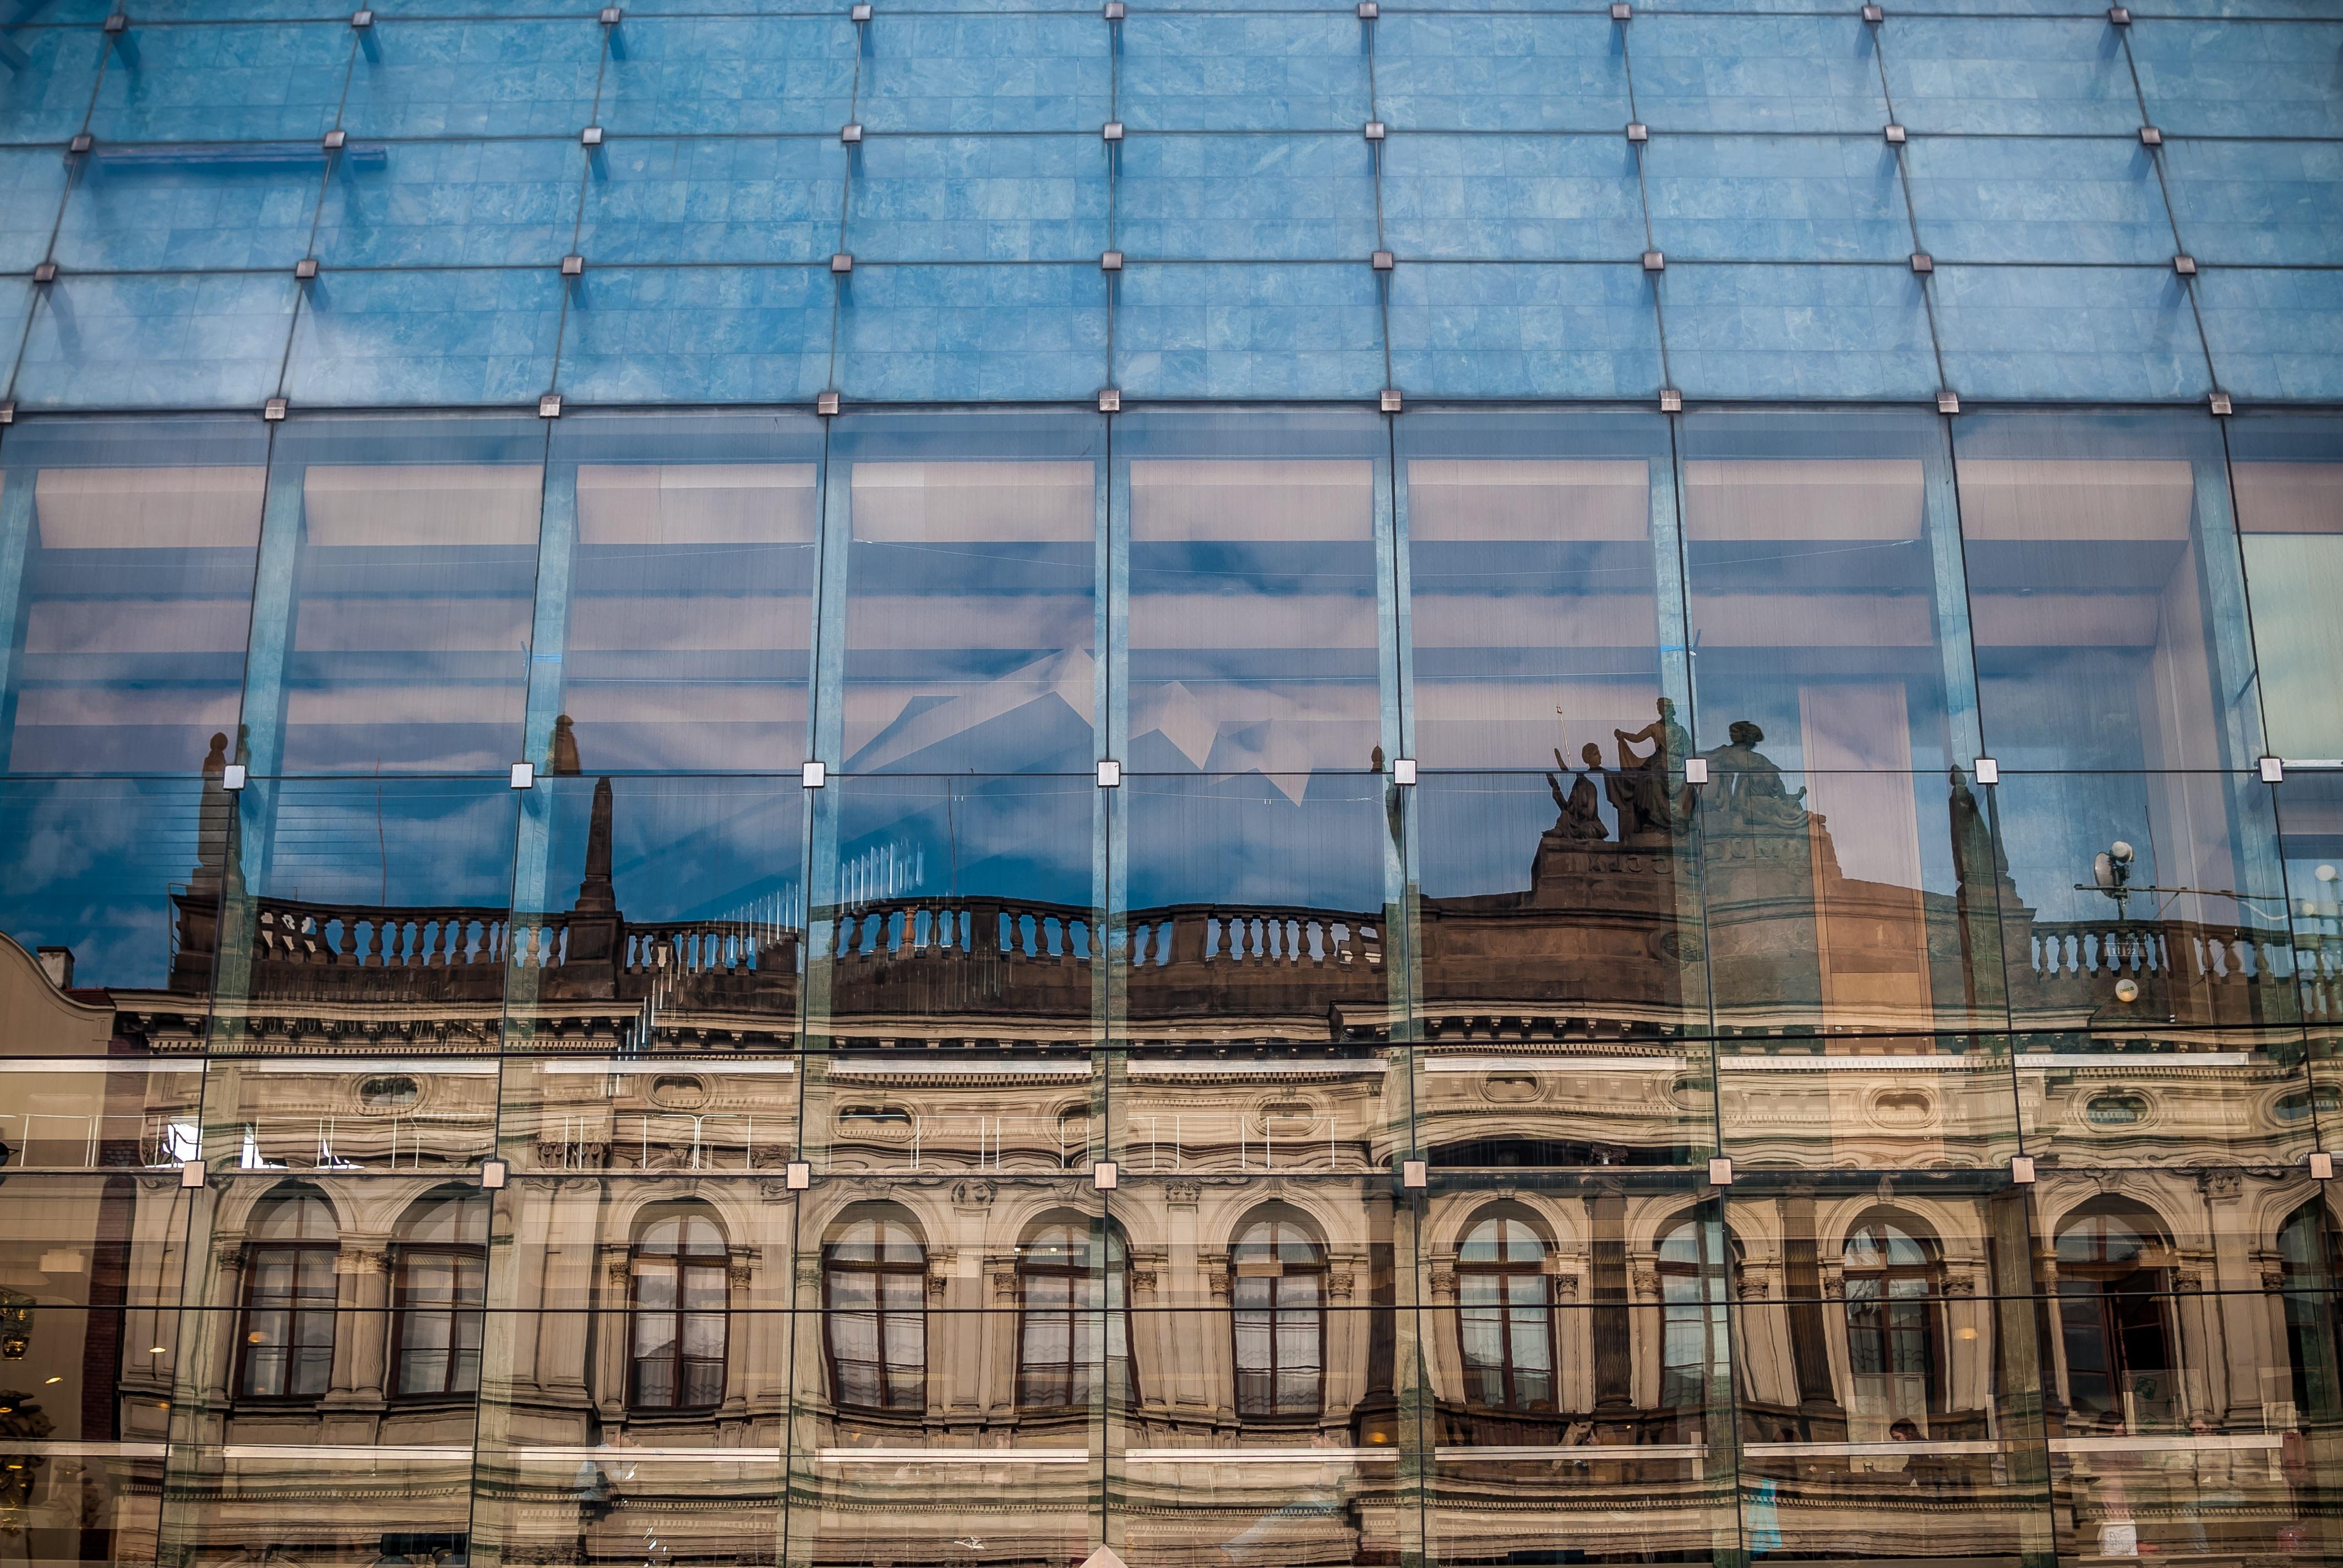 Fotos gratis : arquitectura, estructura, vaso, perspectiva, edificio ...